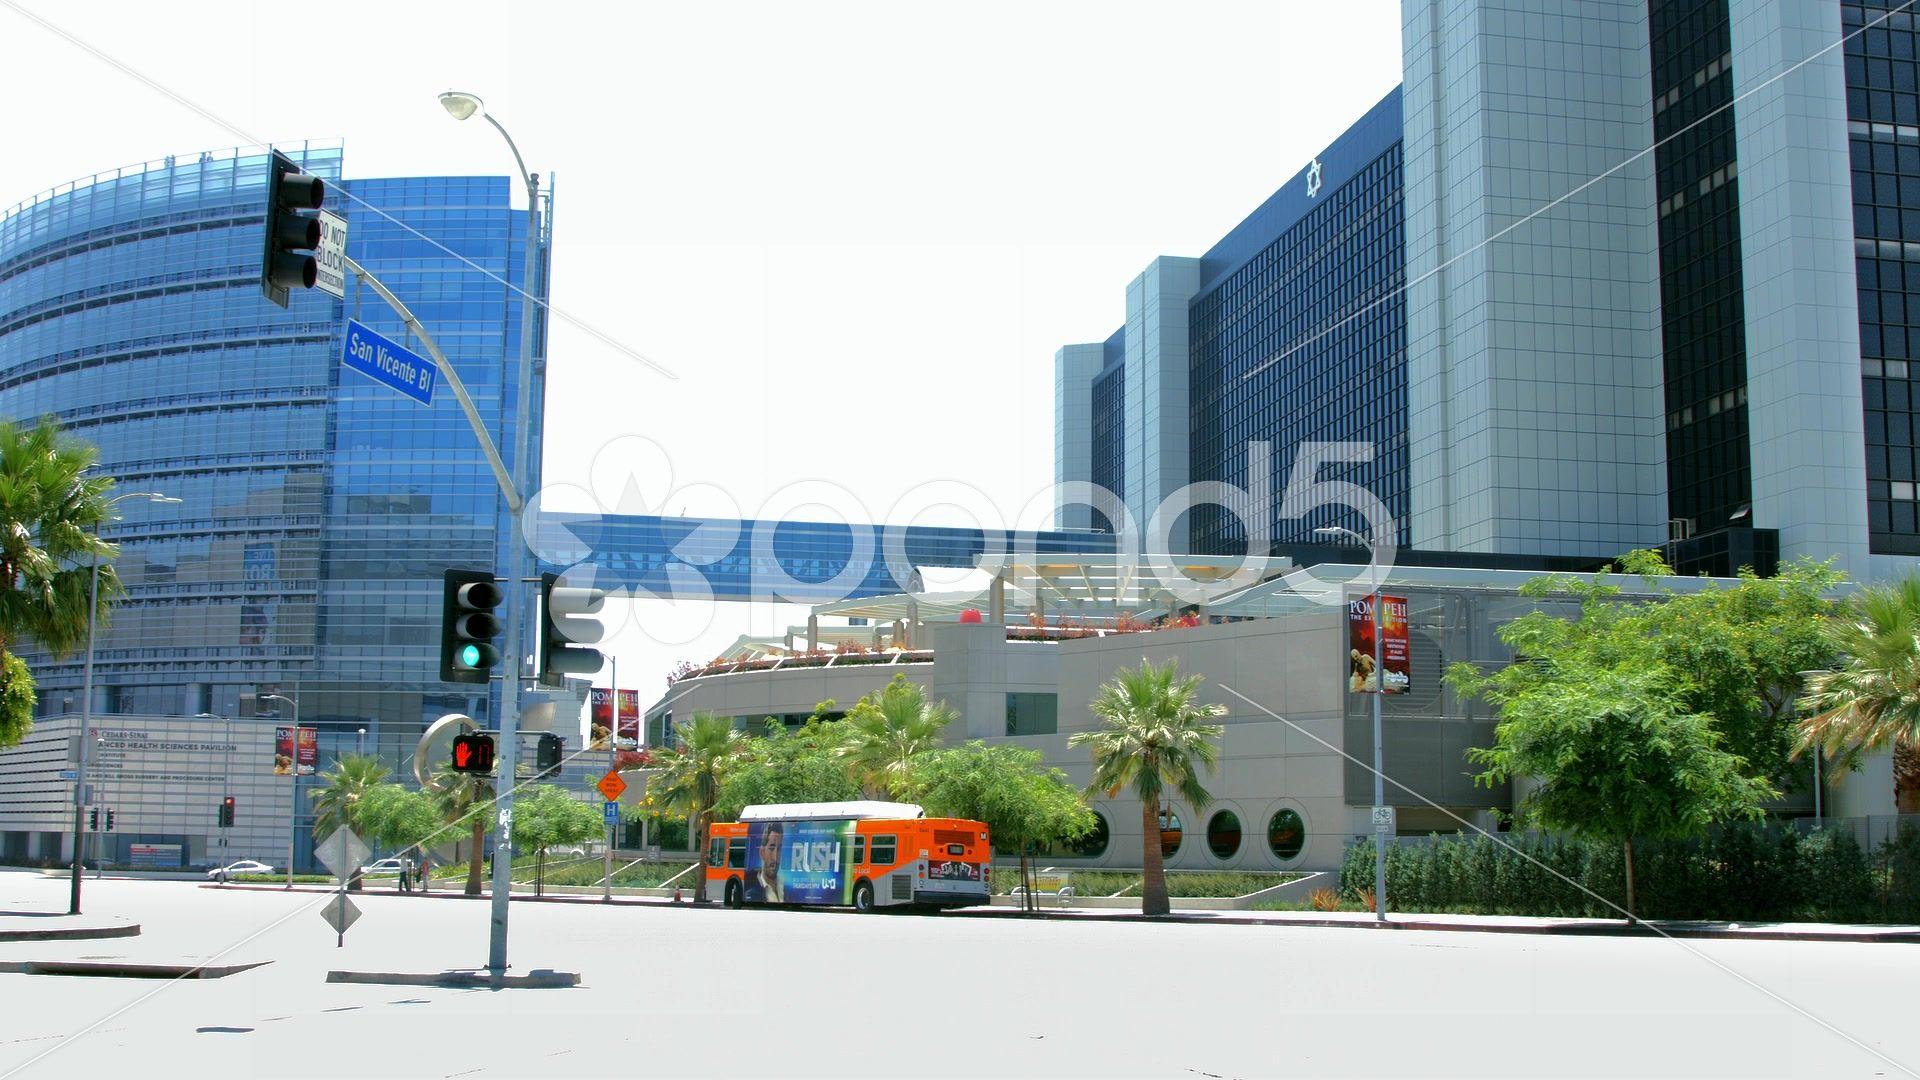 Cedars-Sinai Medical Center in Los Angeles California